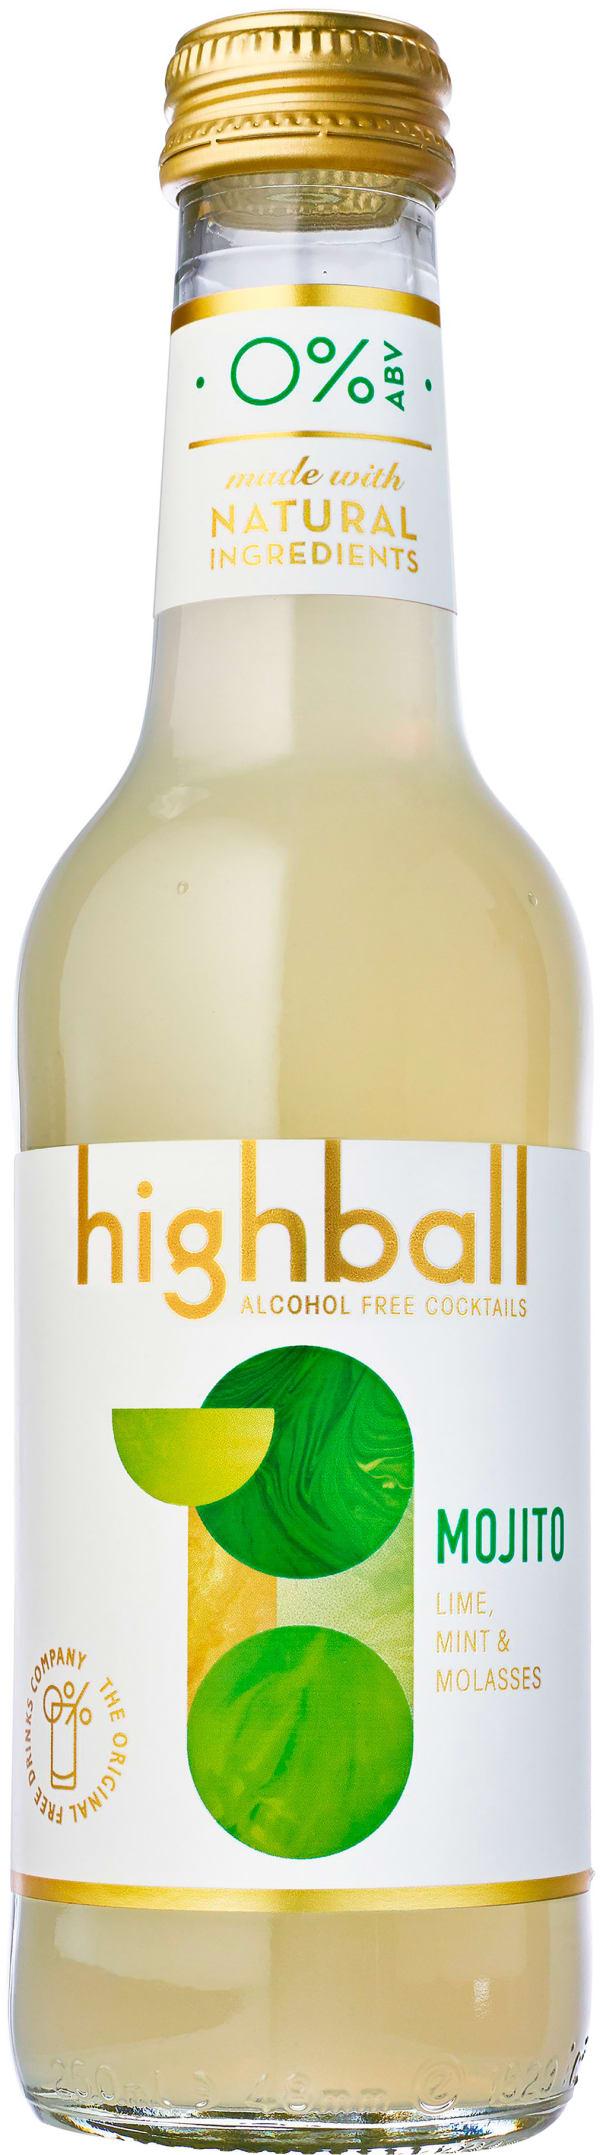 Highball Mojito Alcohol Free Cocktail